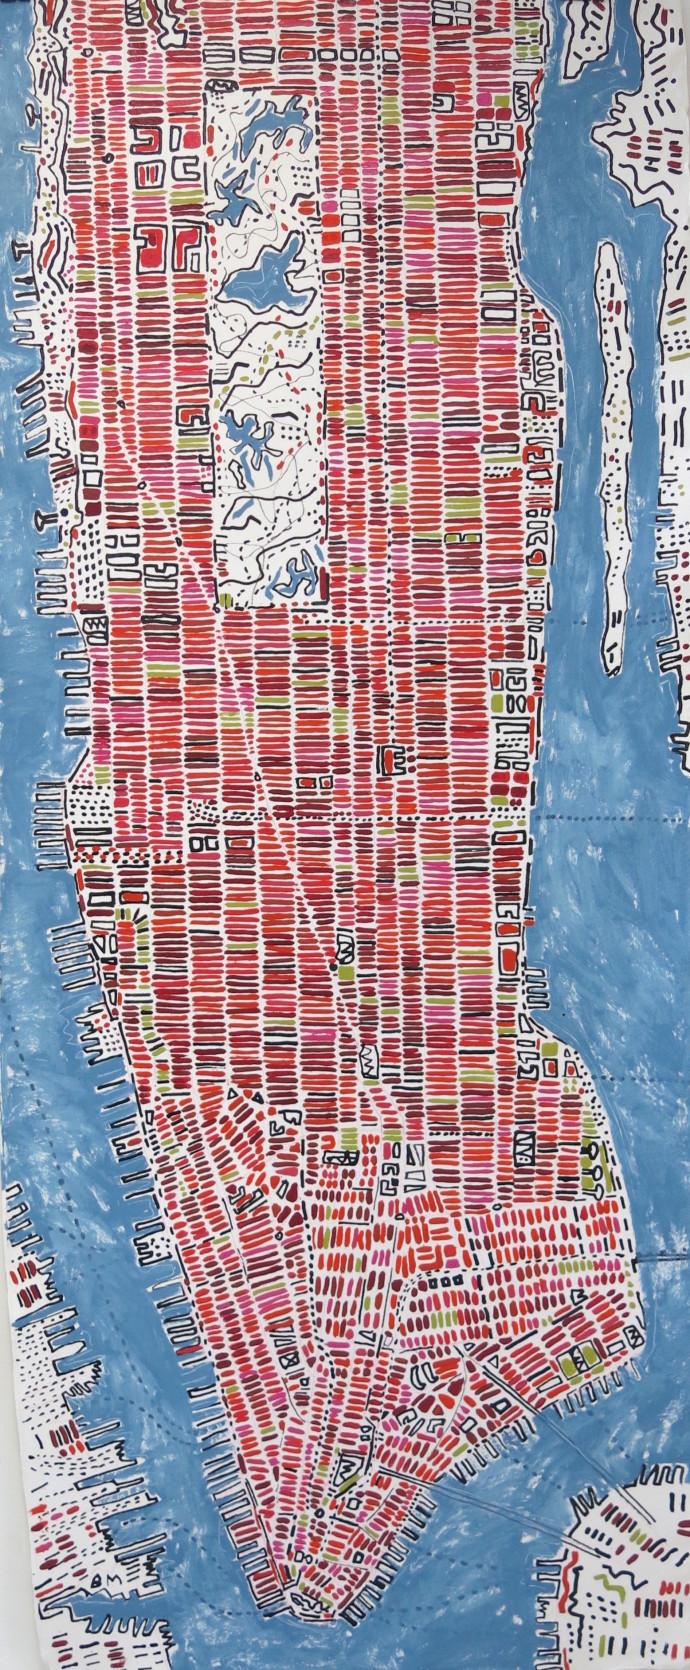 Barbara Macfarlane, Long Manhattan Rosehip, 2017